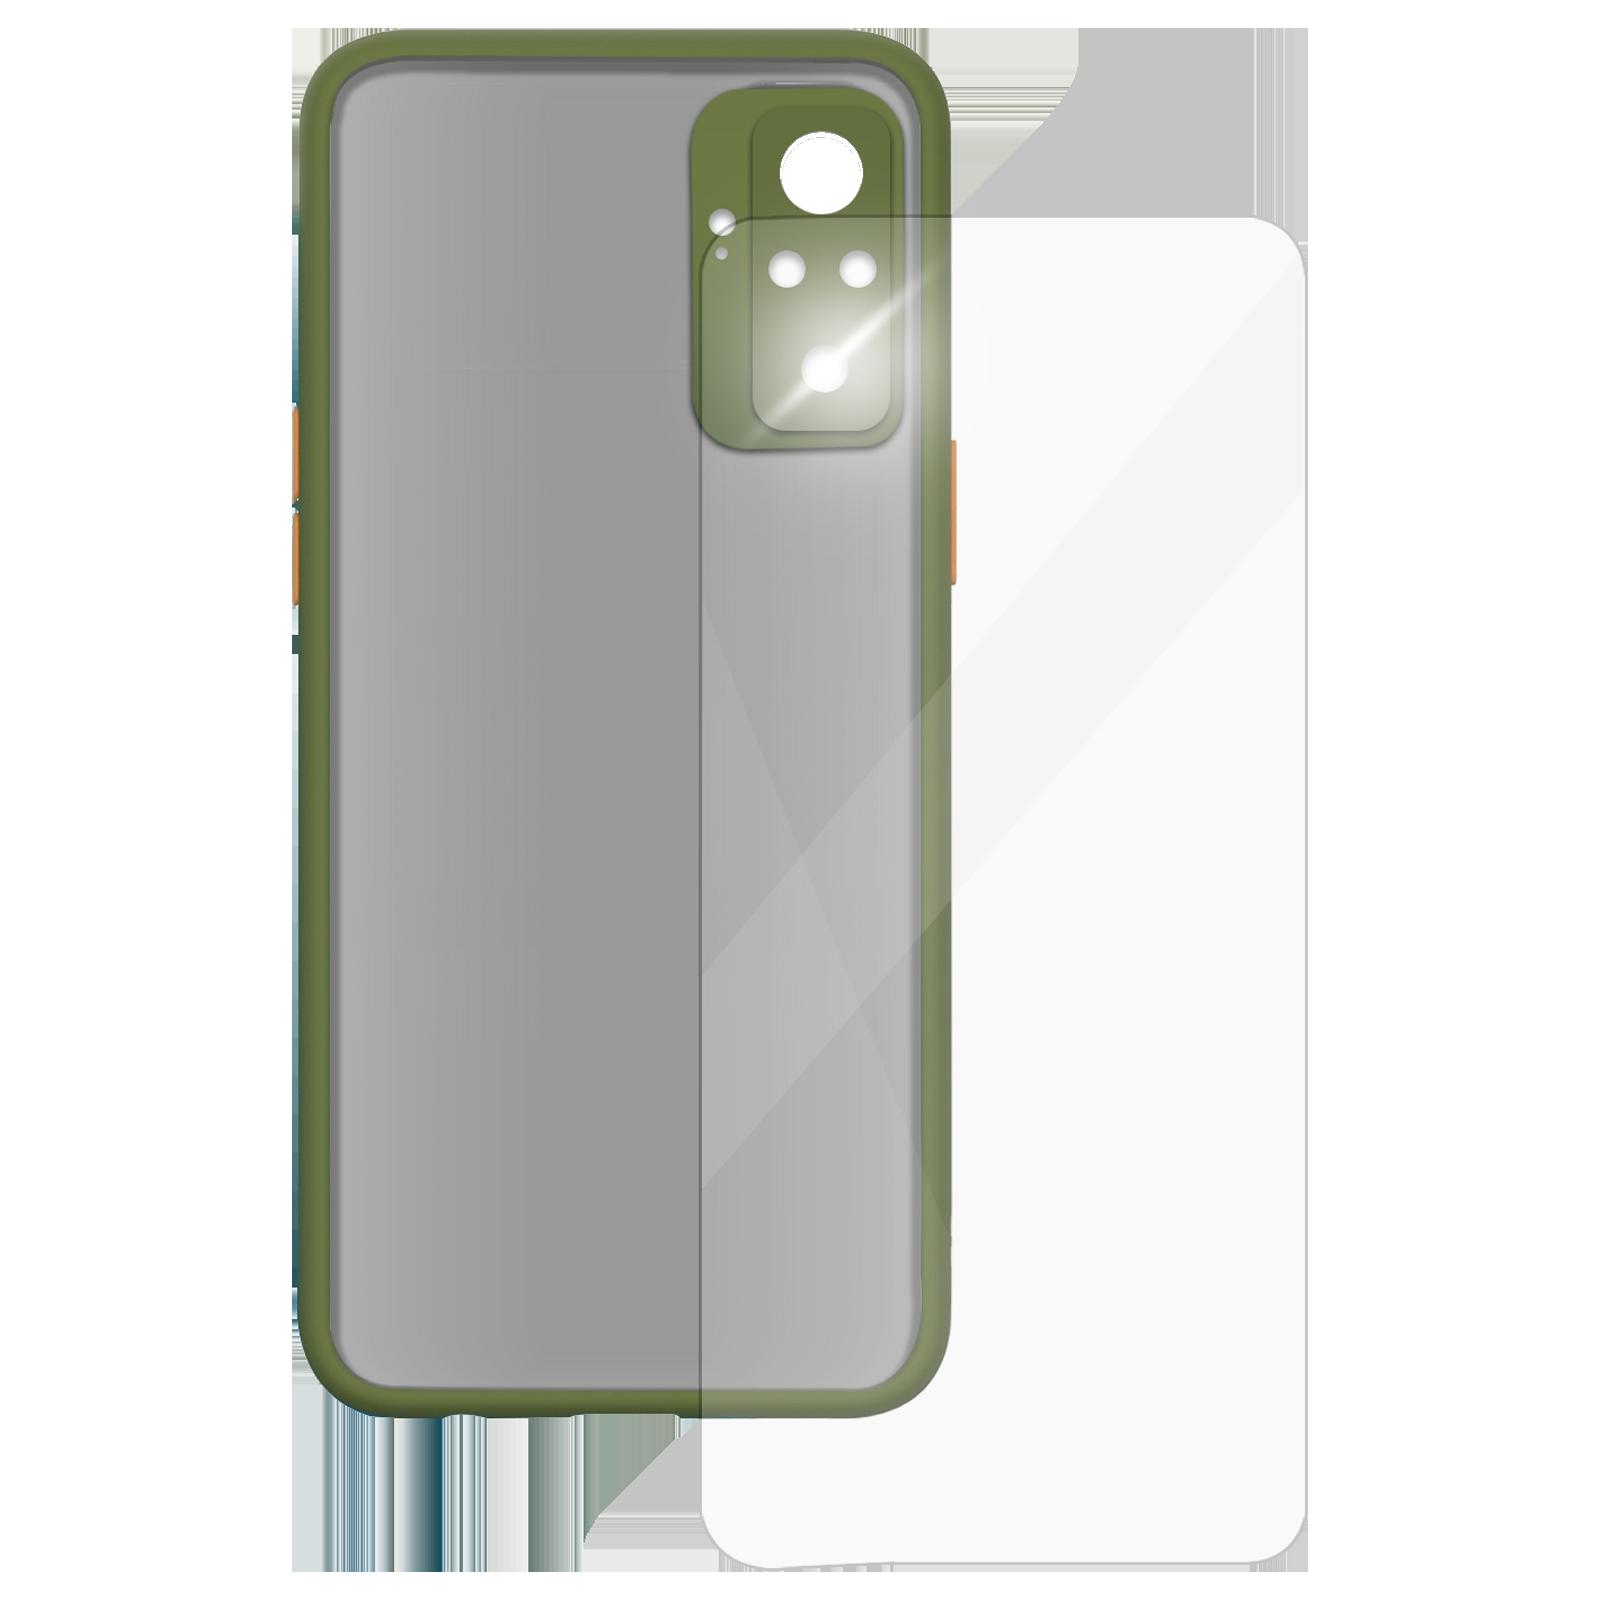 Arrow Camera Duplex Back Case and Screen Protector Bundle For Xiaomi Redmi Note 10 Pro Max (Ultra Transparent Visibility, AR-1007, Light Green)_1